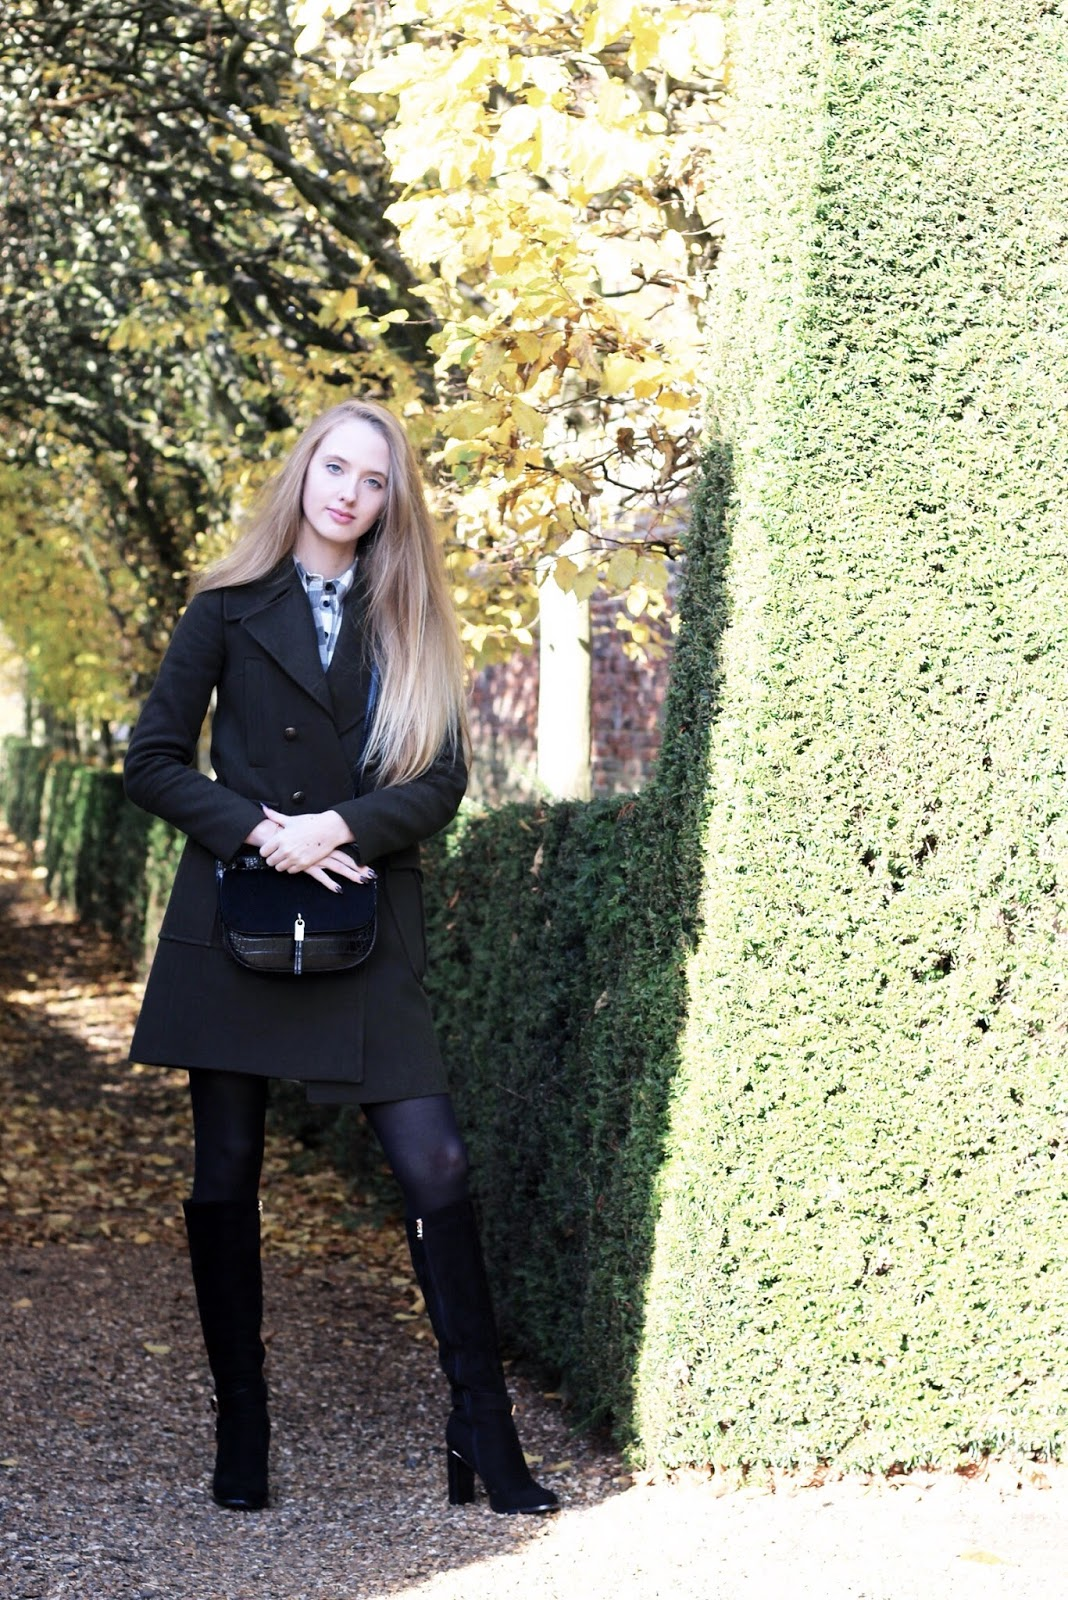 Khaki zara military coat styling london fashion blogger